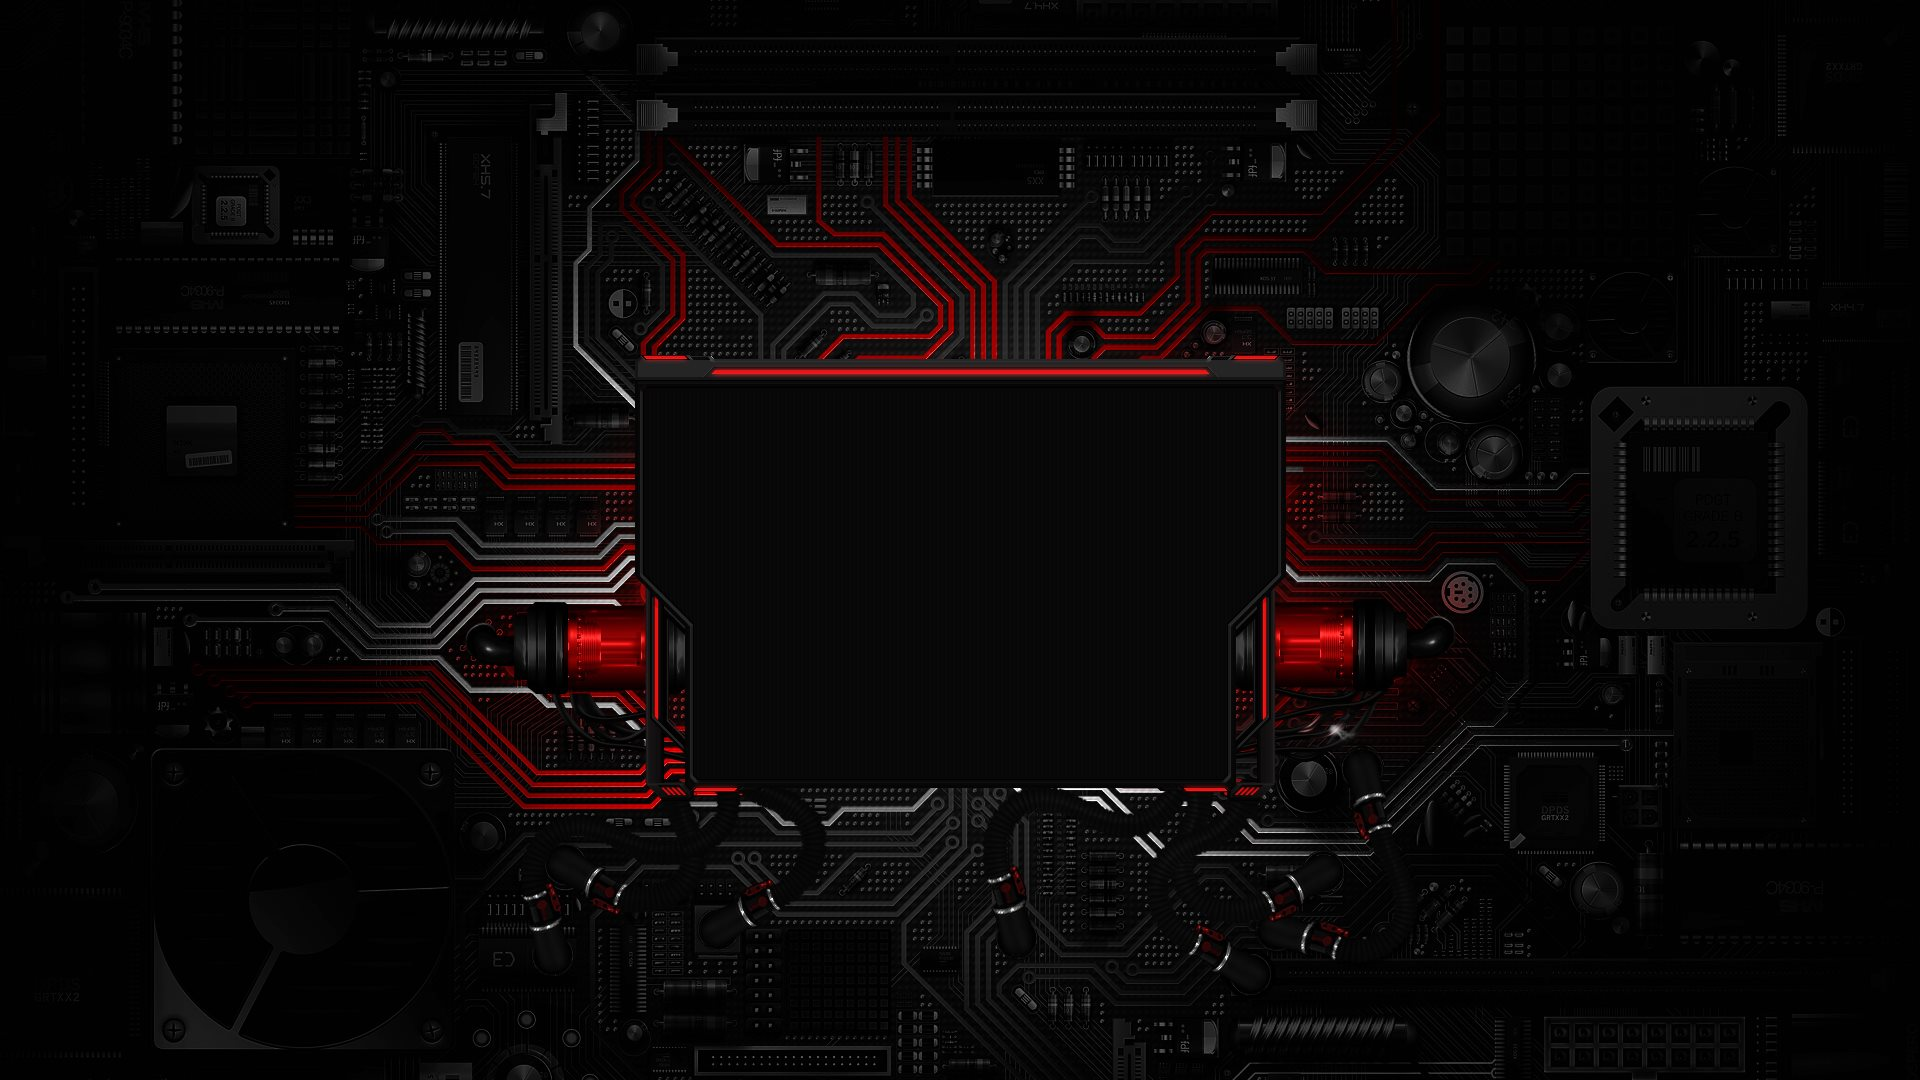 45 Hi Tech Wallpapers For Desktop and Laptops 1920x1080